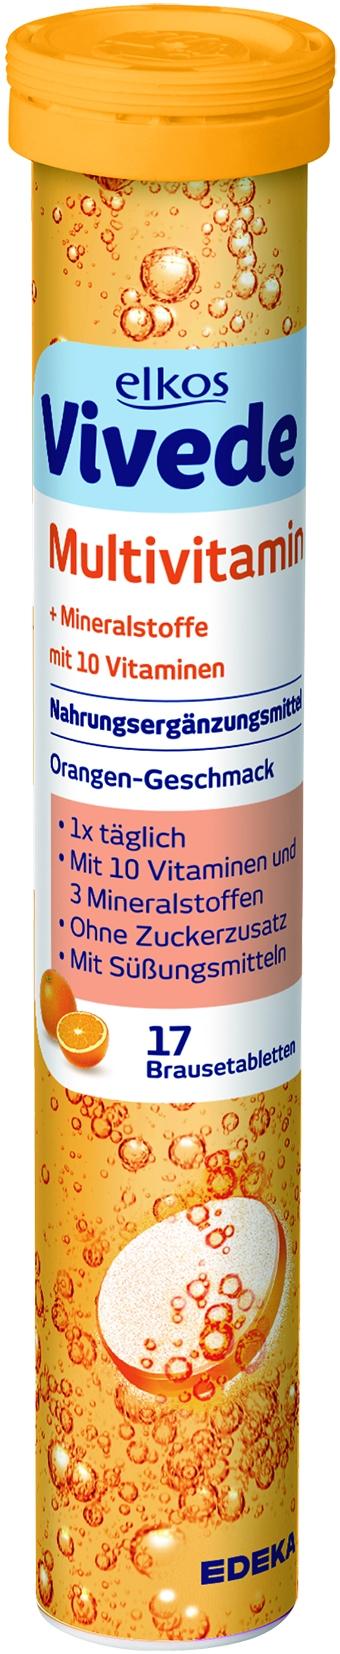 VIVEDE Brausetabletten Multivitamin 17er